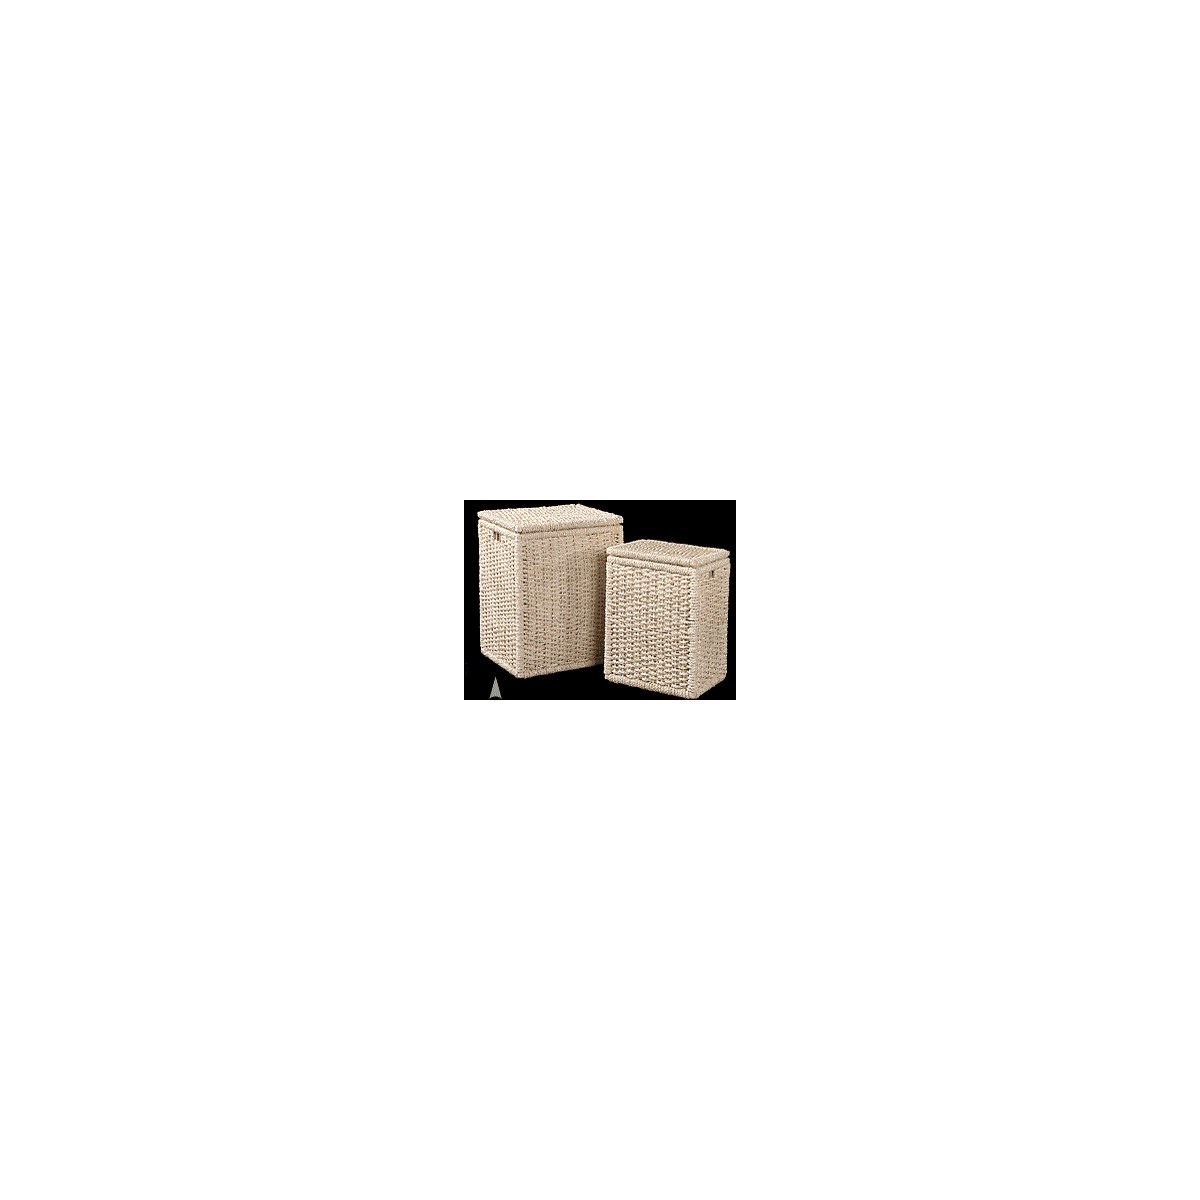 5/854 S/2 OBLONG MAIZE HAMPERS W/CLOTH LINER CS. PK.: 1